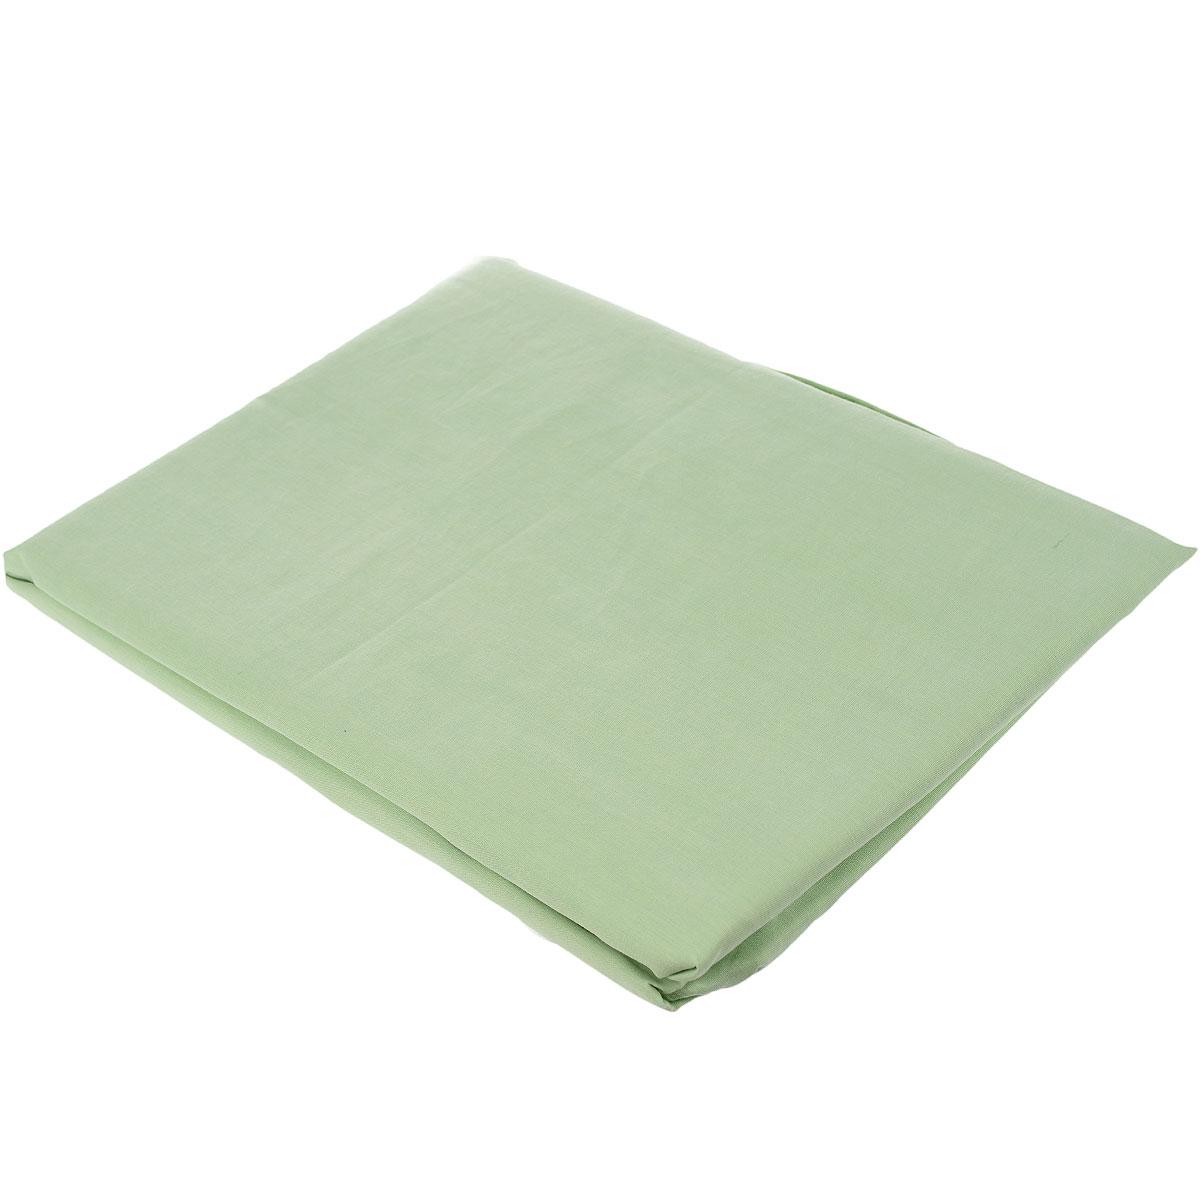 "Простыня на резинке ""Style"", цвет: зеленый, 180 см х 200 см. 114911407, Primavelle"